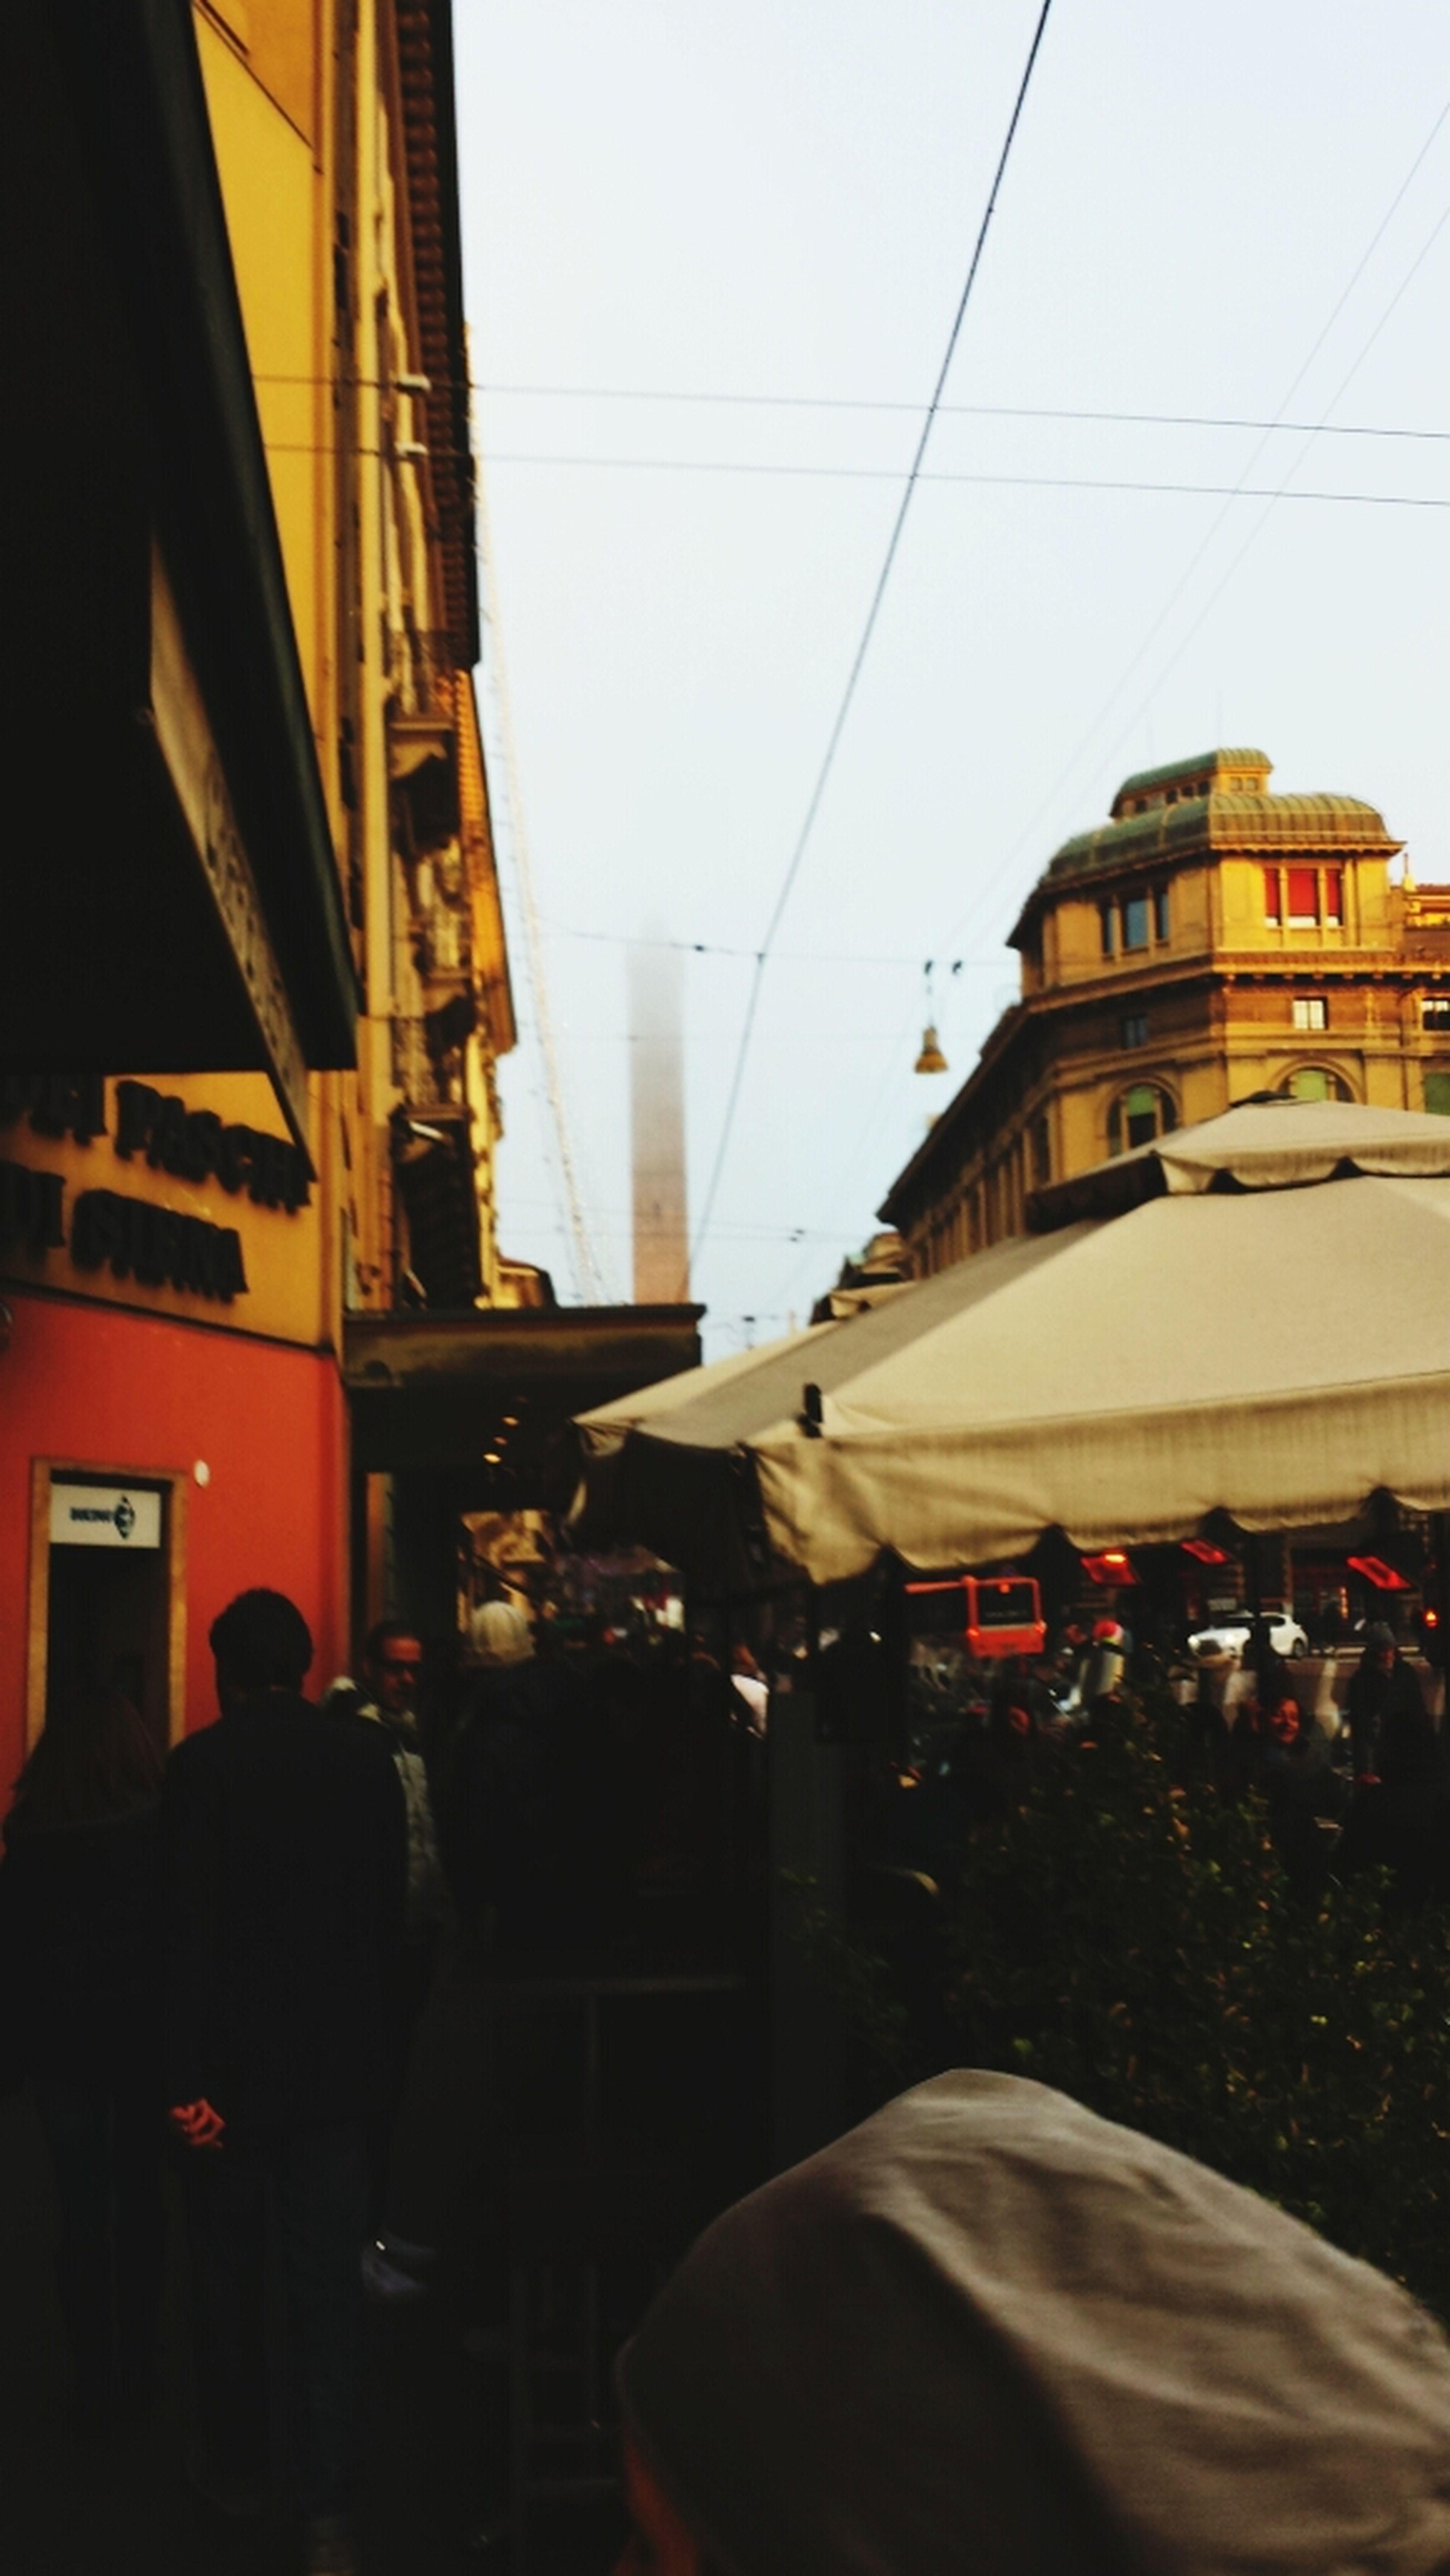 Botown Shopping ♡ Xmas Italy